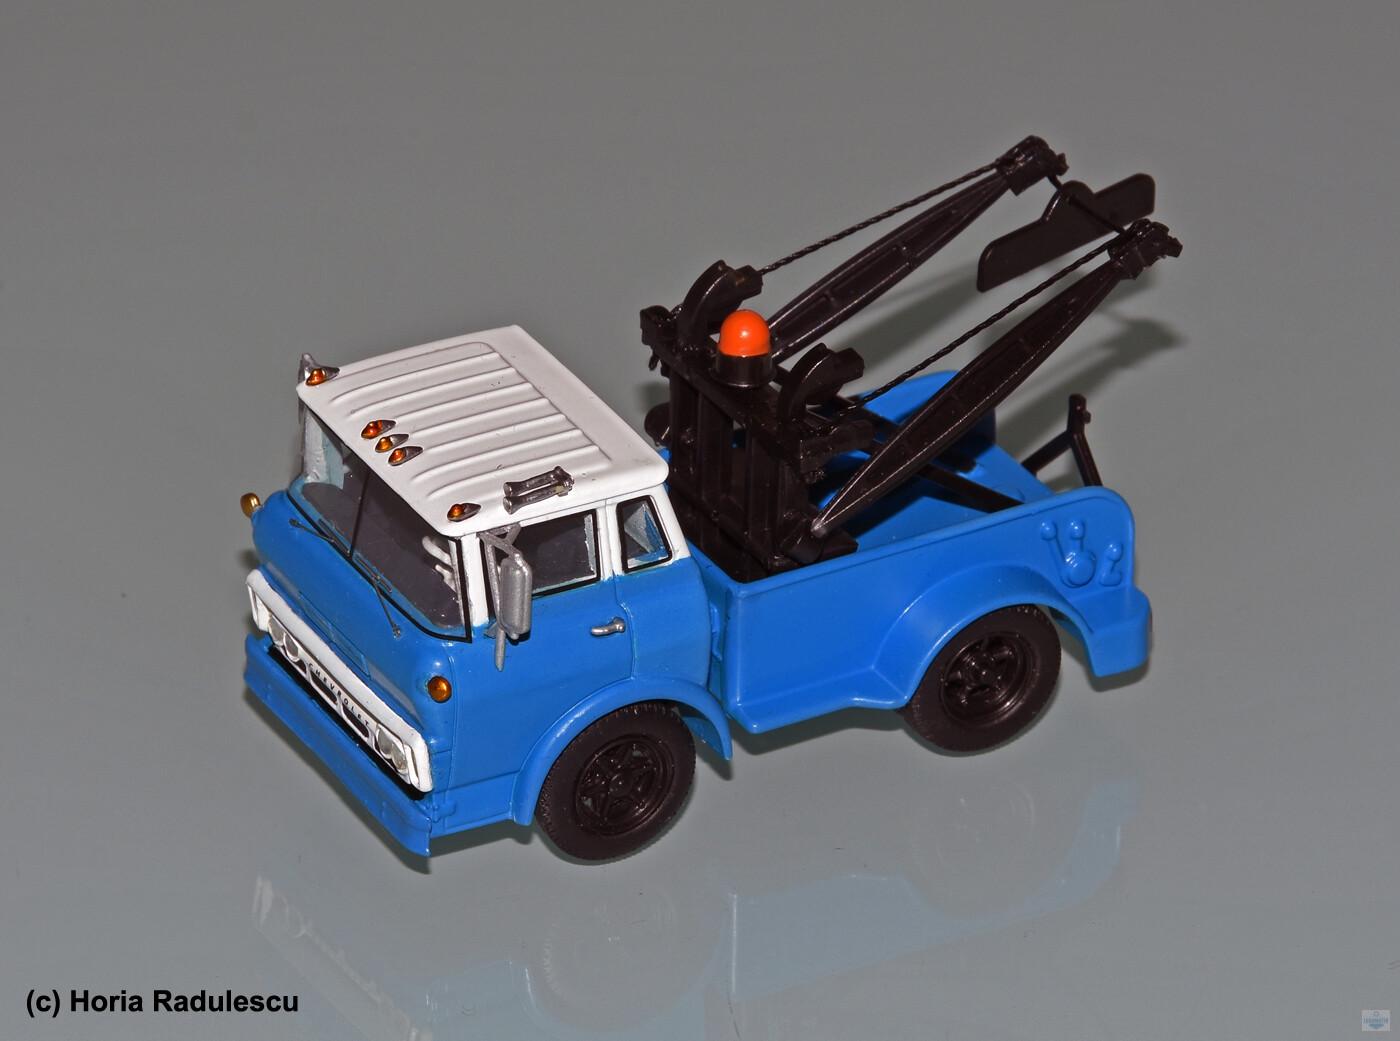 64-NYPD-MTD-Chevrolet-Umbau-HR-1.jpg